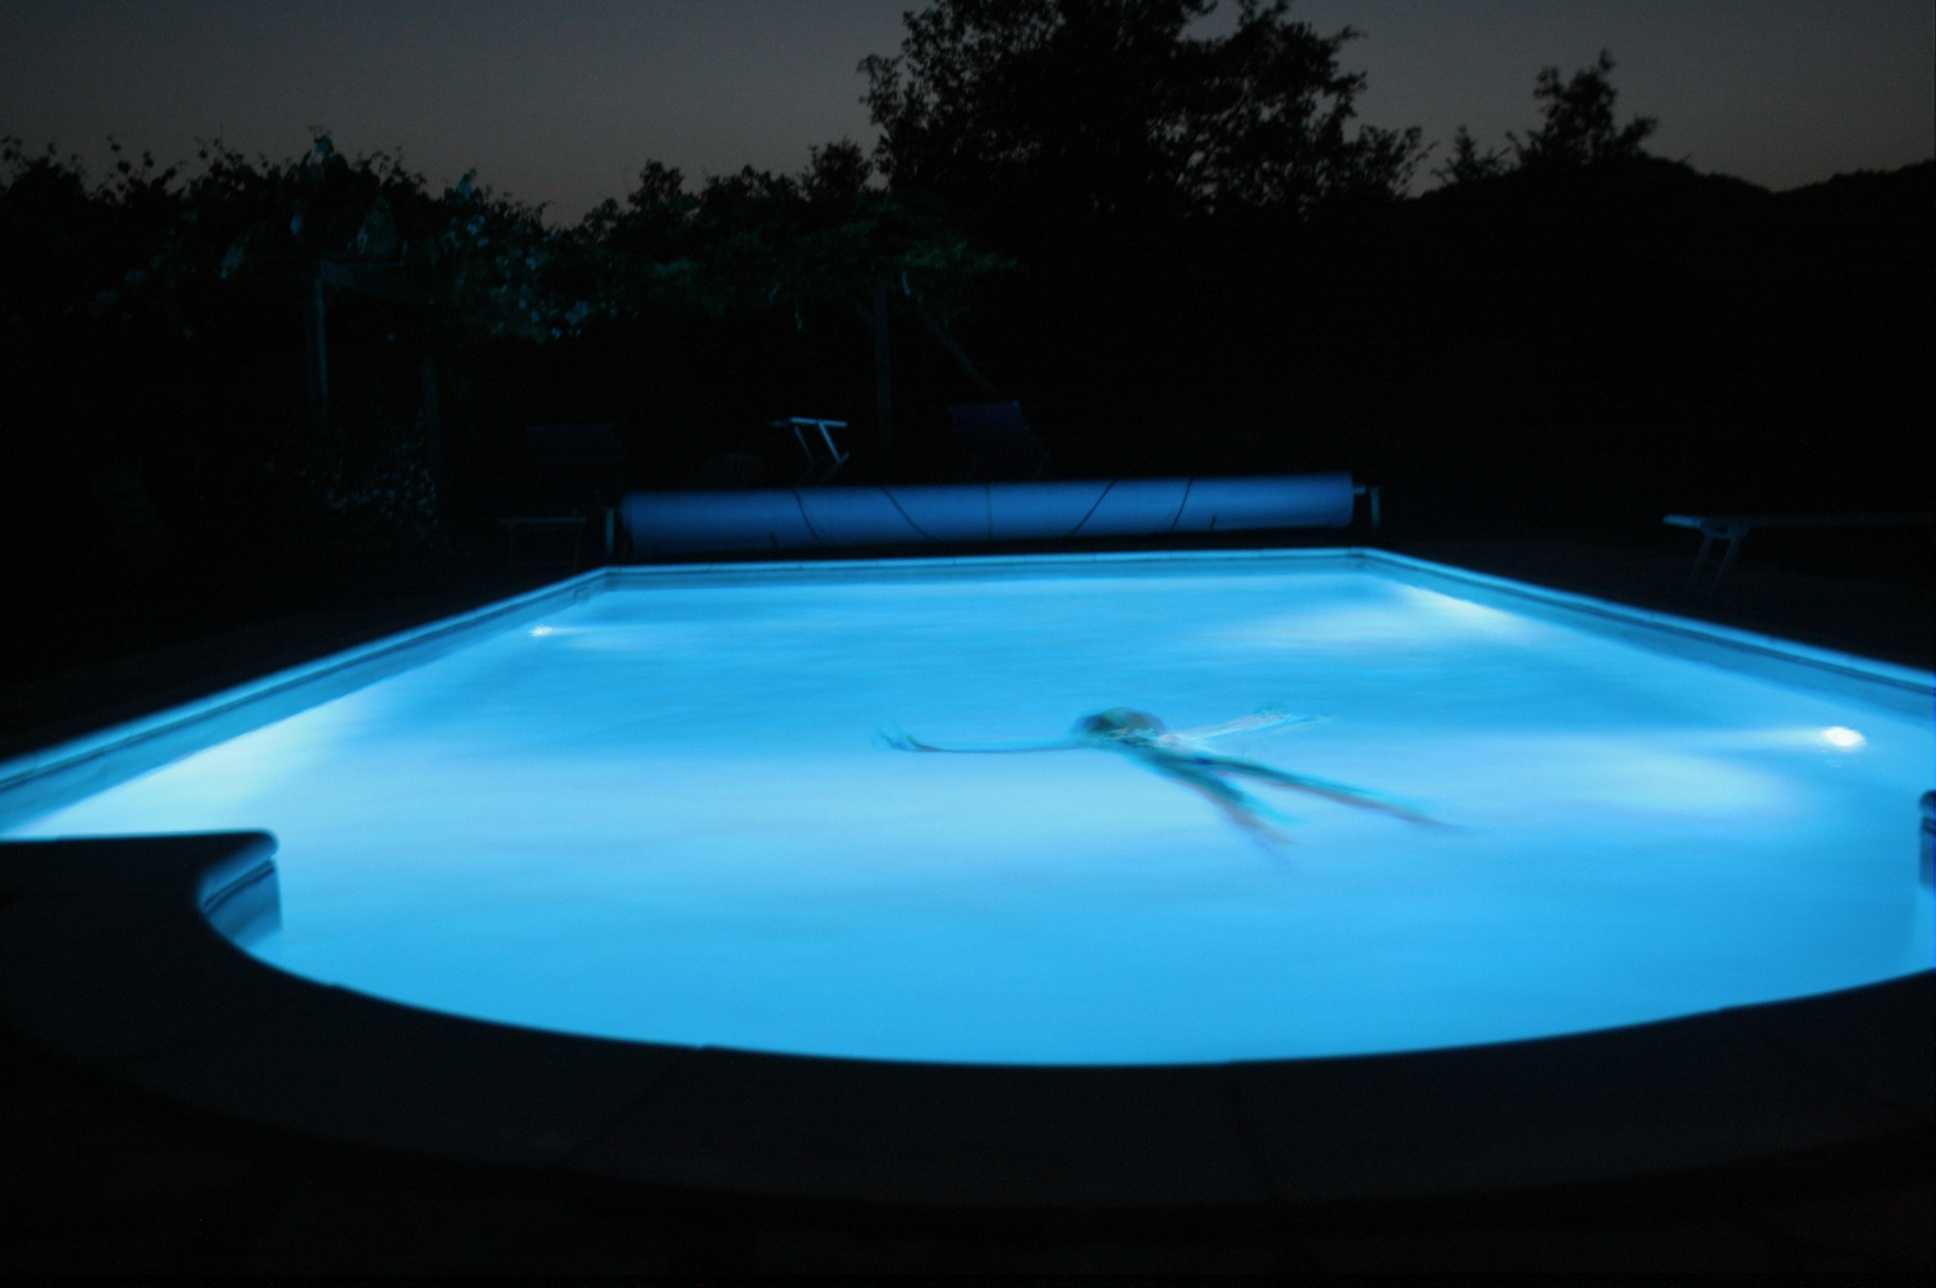 Inspirational Swimming Pool Light at